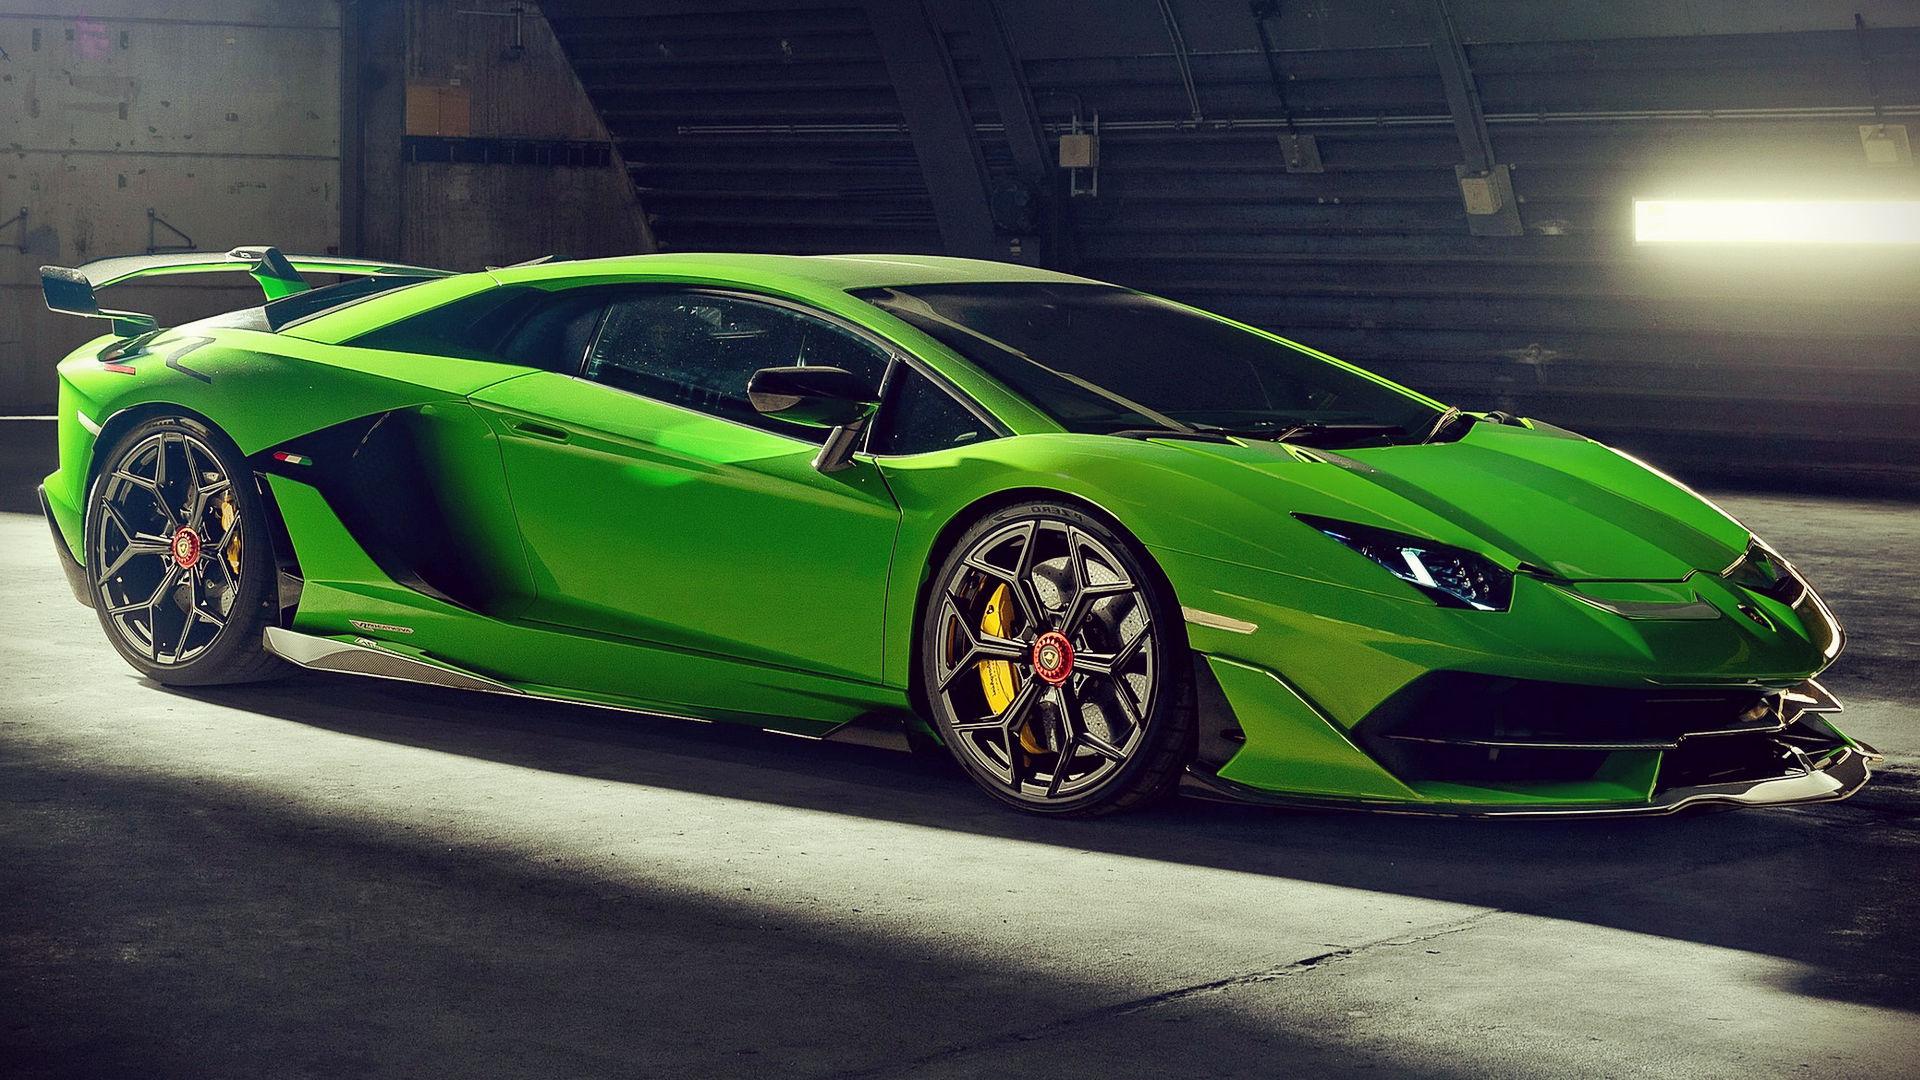 Novitec Lamborghini Aventador SVJ 2020